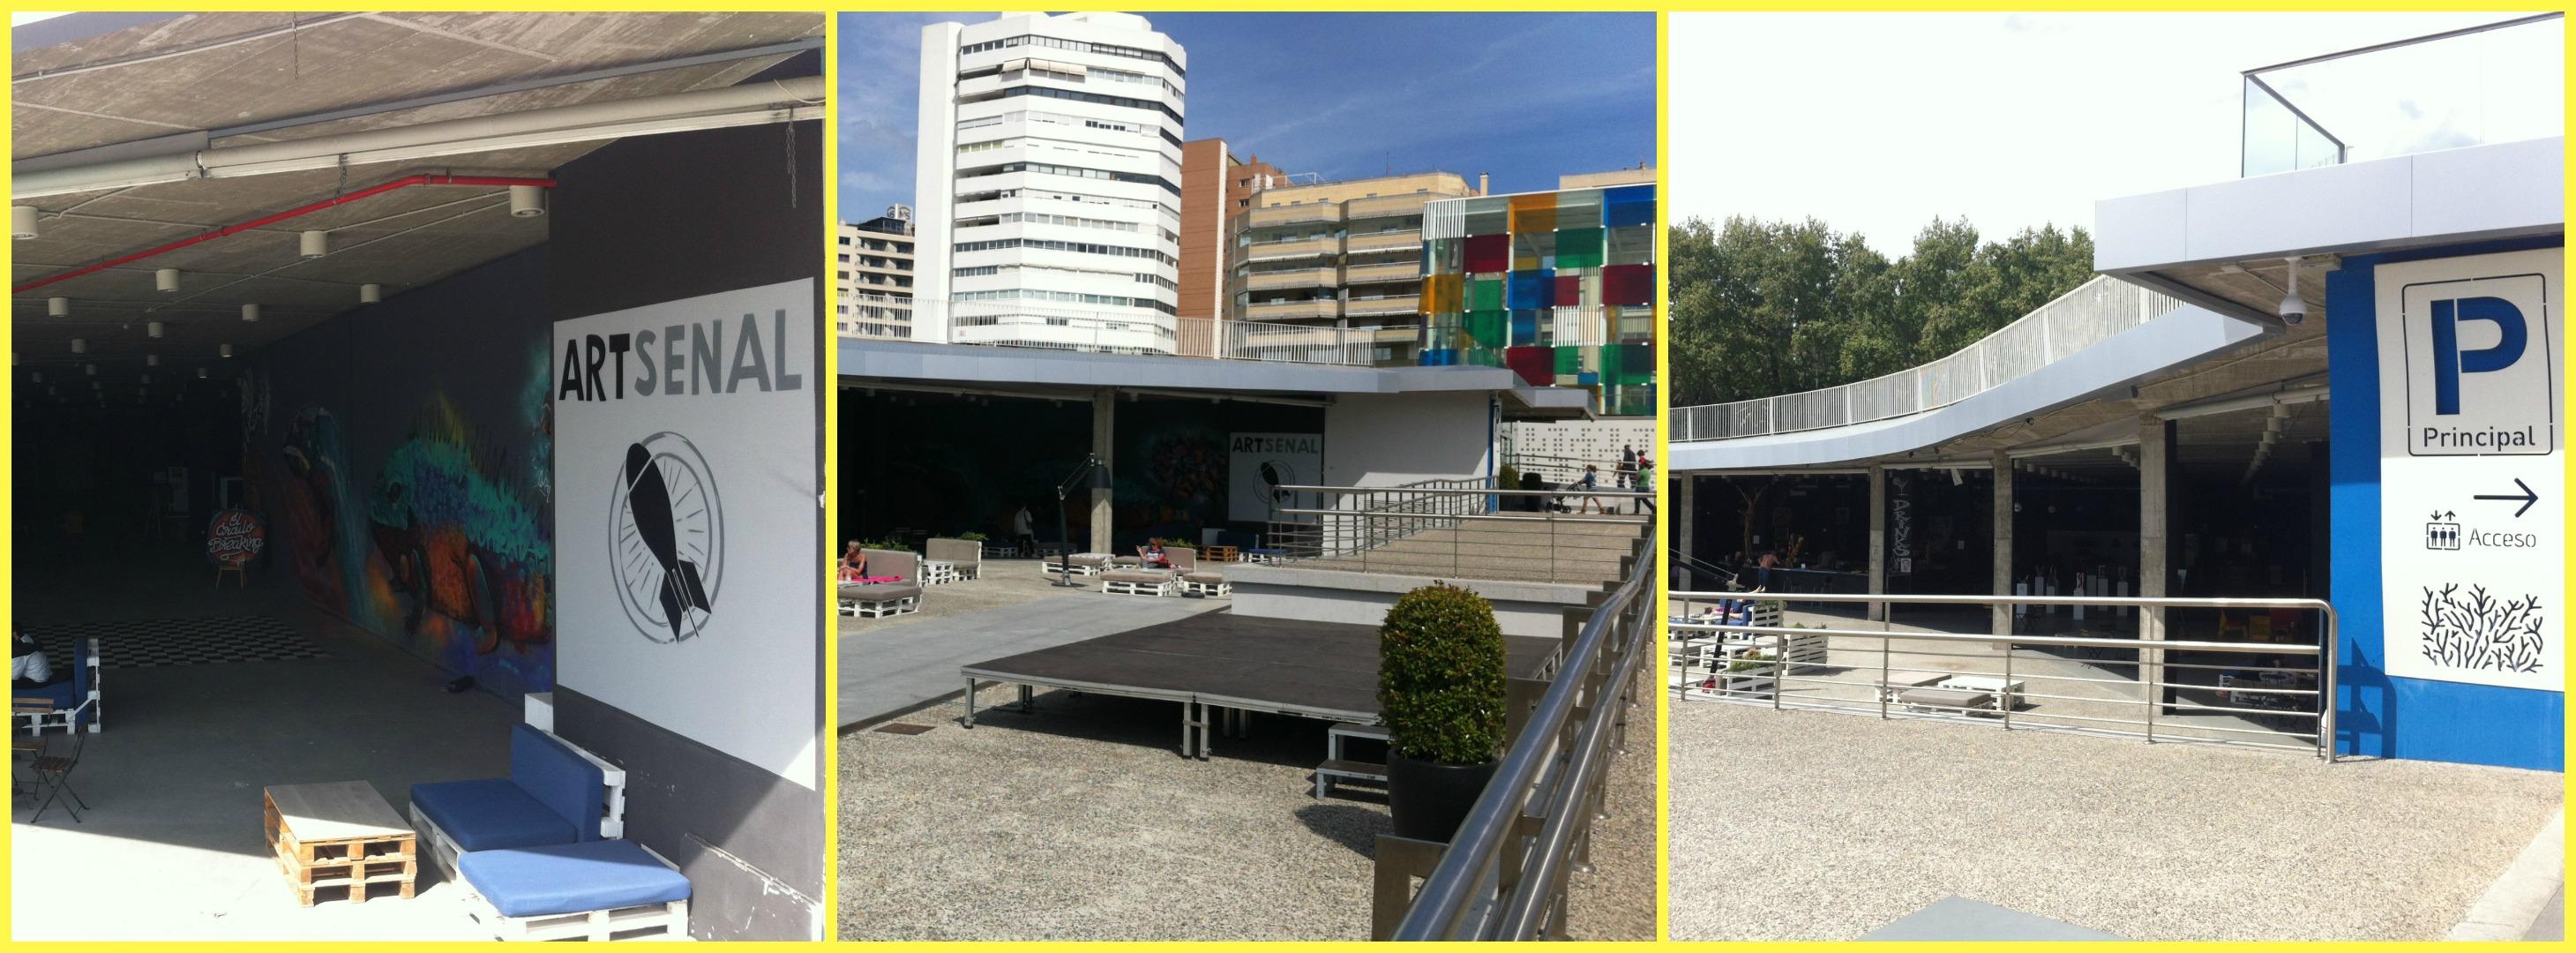 Artsenal Exhibition Centre